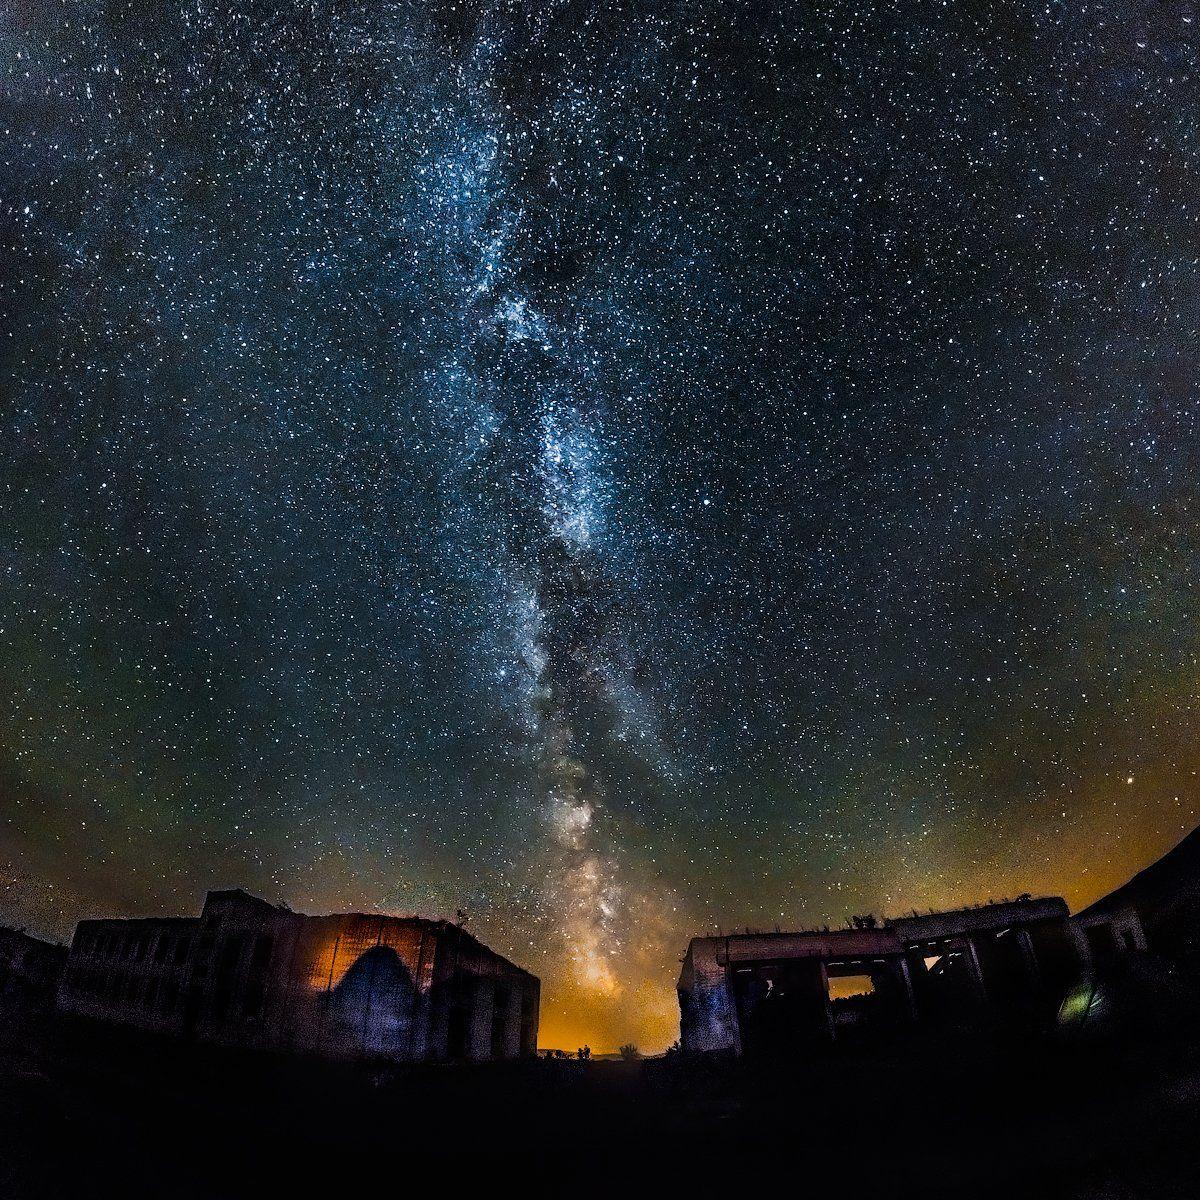 canon, canon70d, milkyway, milky way, night, landscape, landcapes, nature, stars, природа, звезды, млечный путь, Дмитрий Шеремет